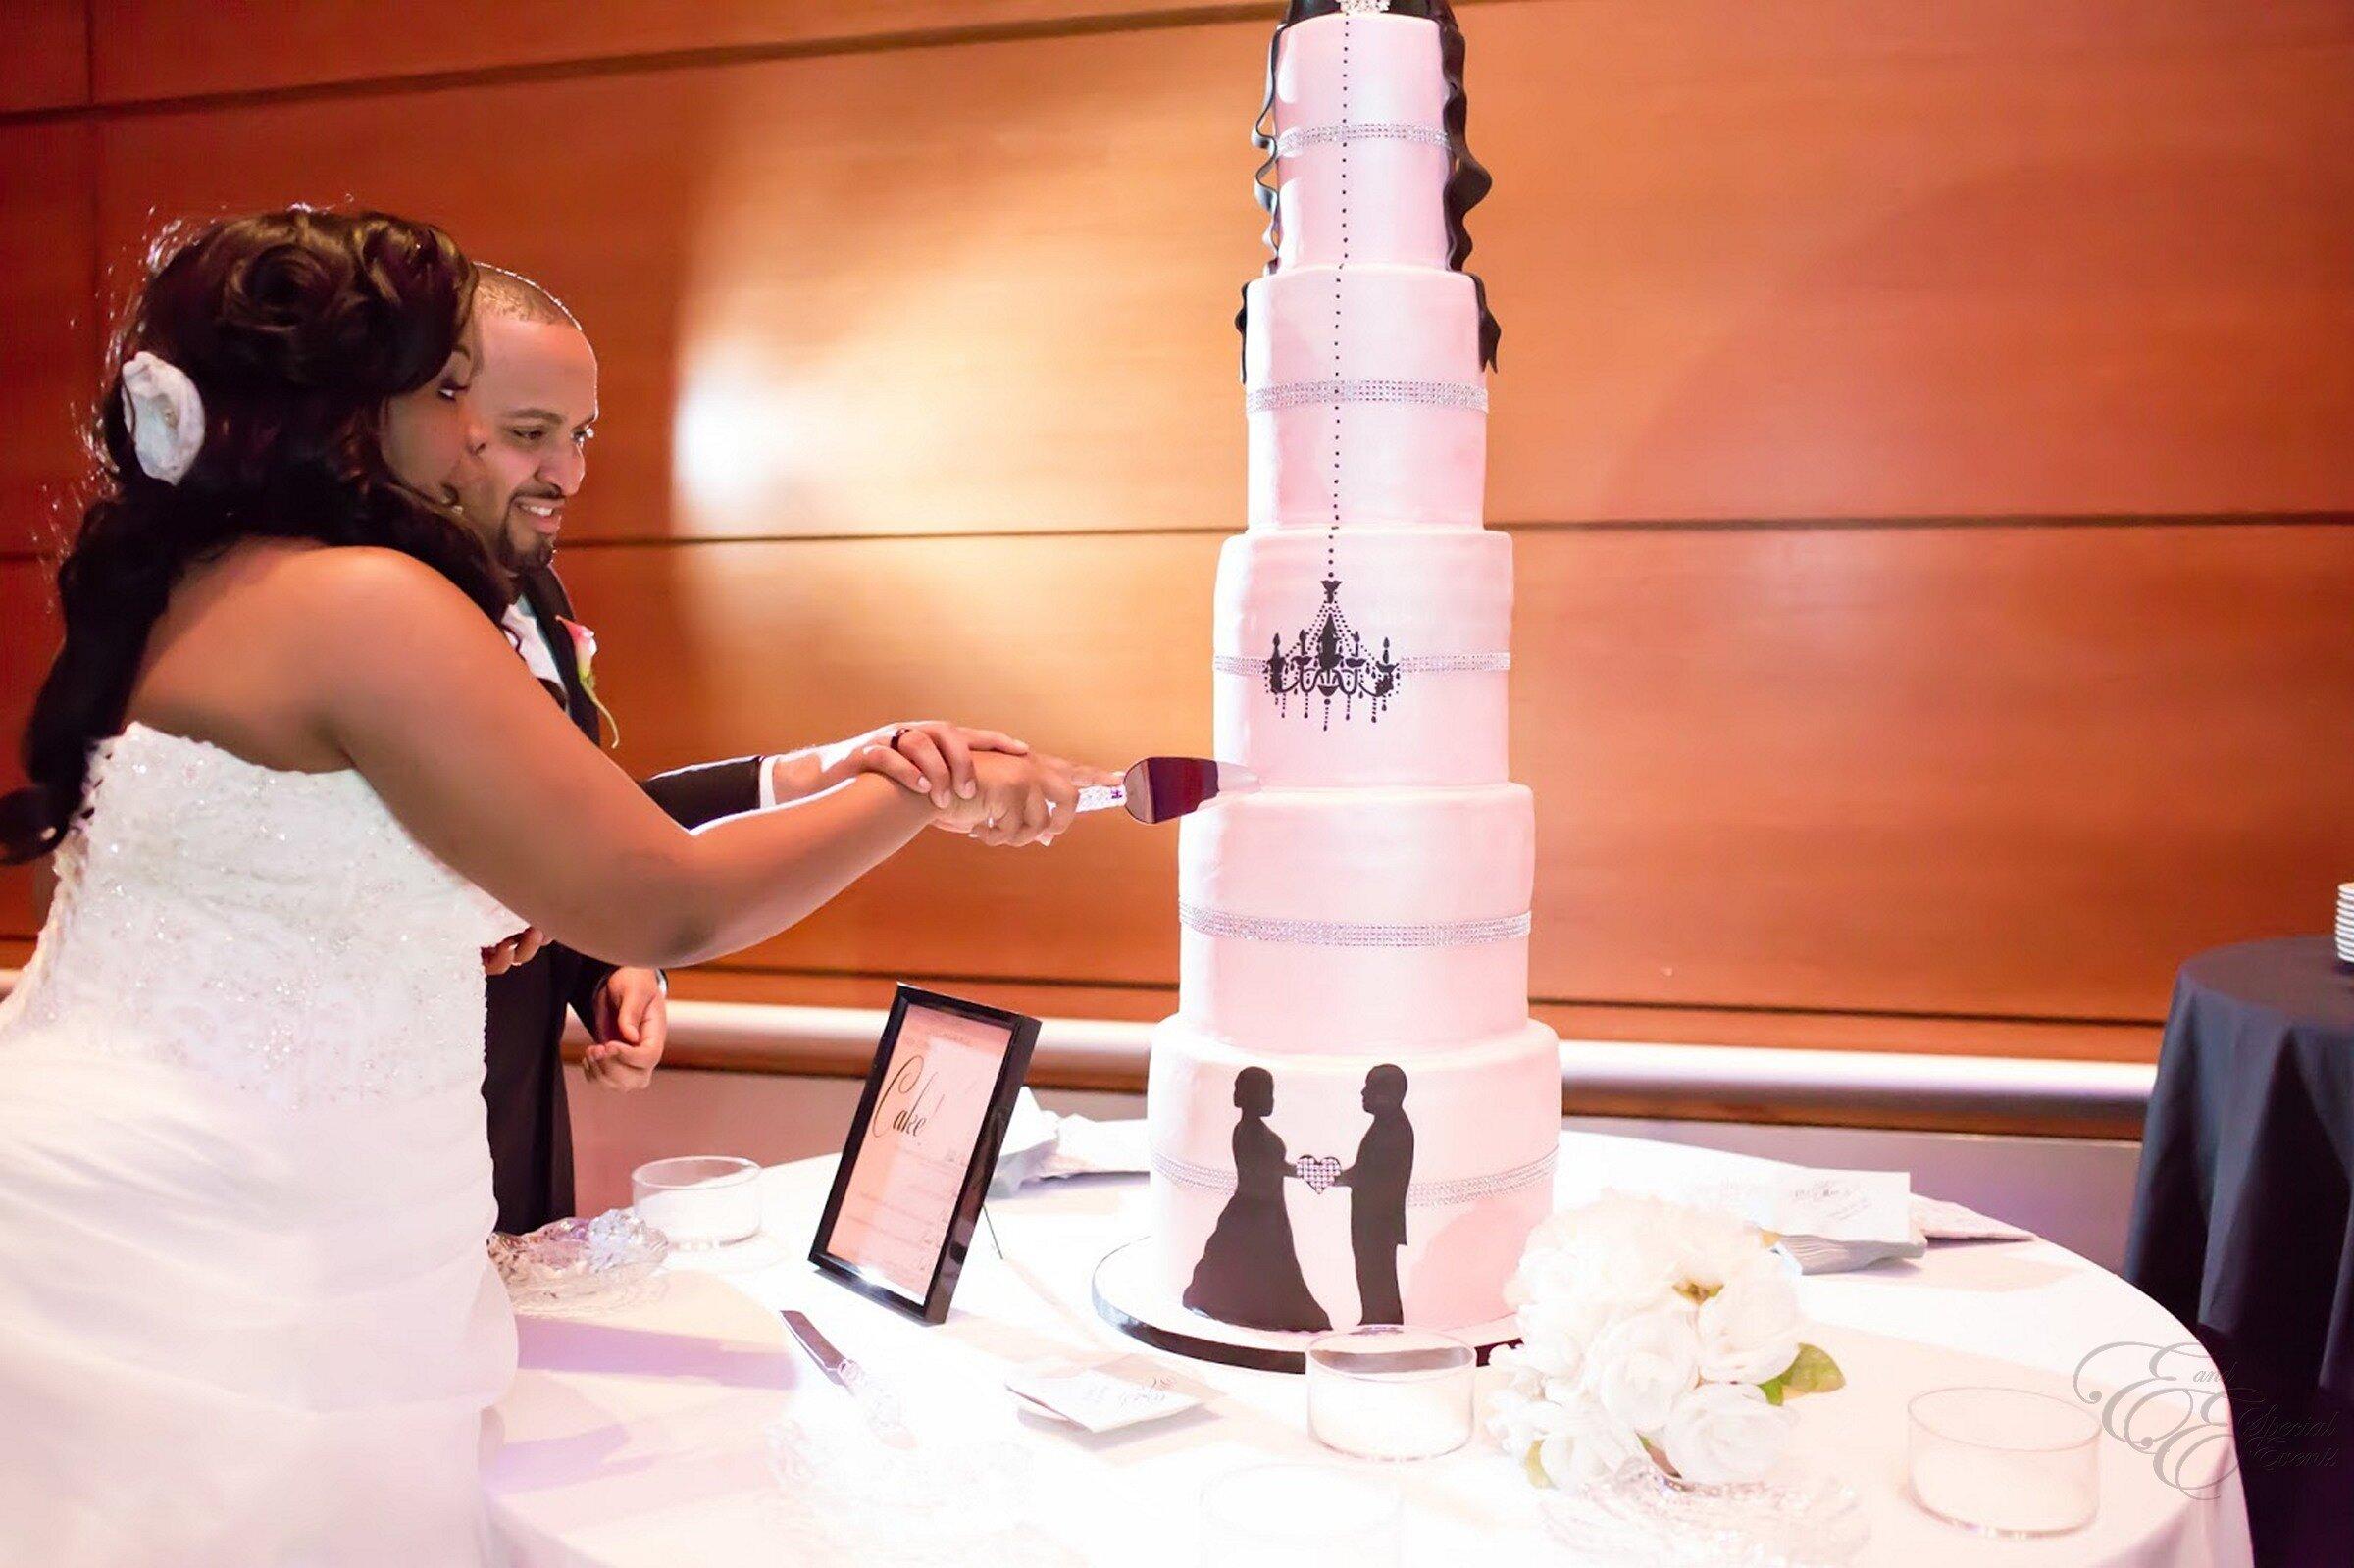 Cake_Cutting.jpg